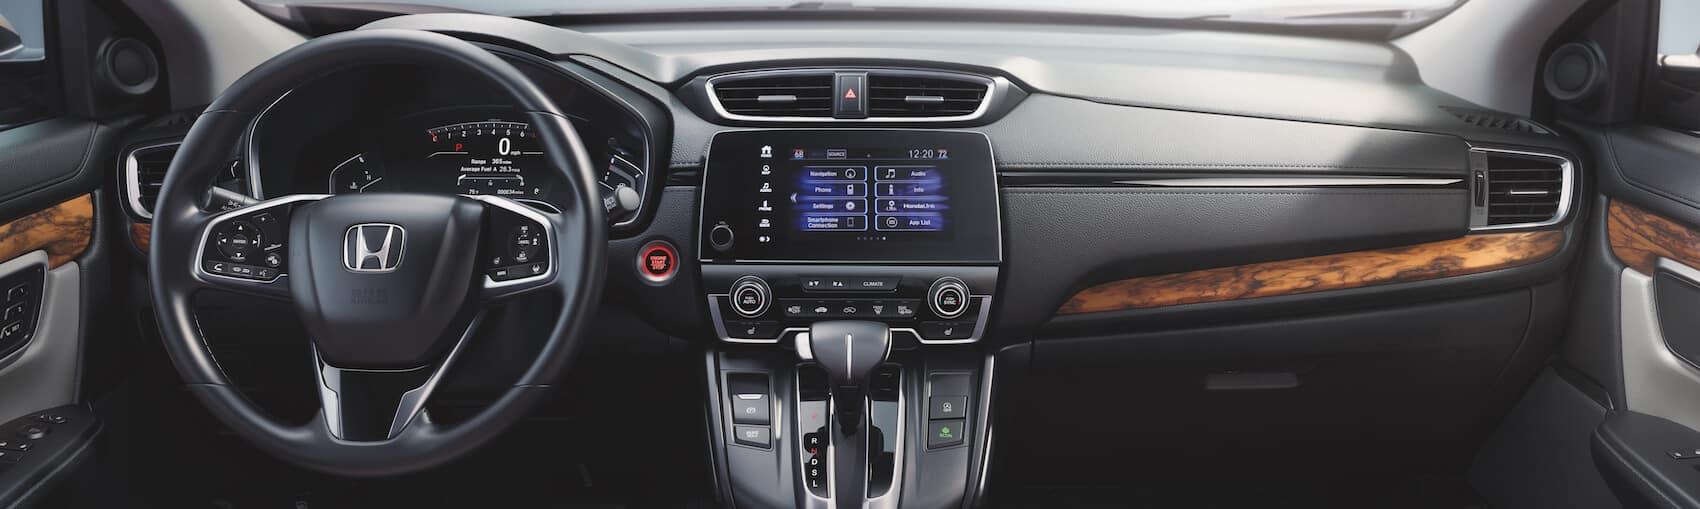 2020 Honda CR-V interior Abington, PA